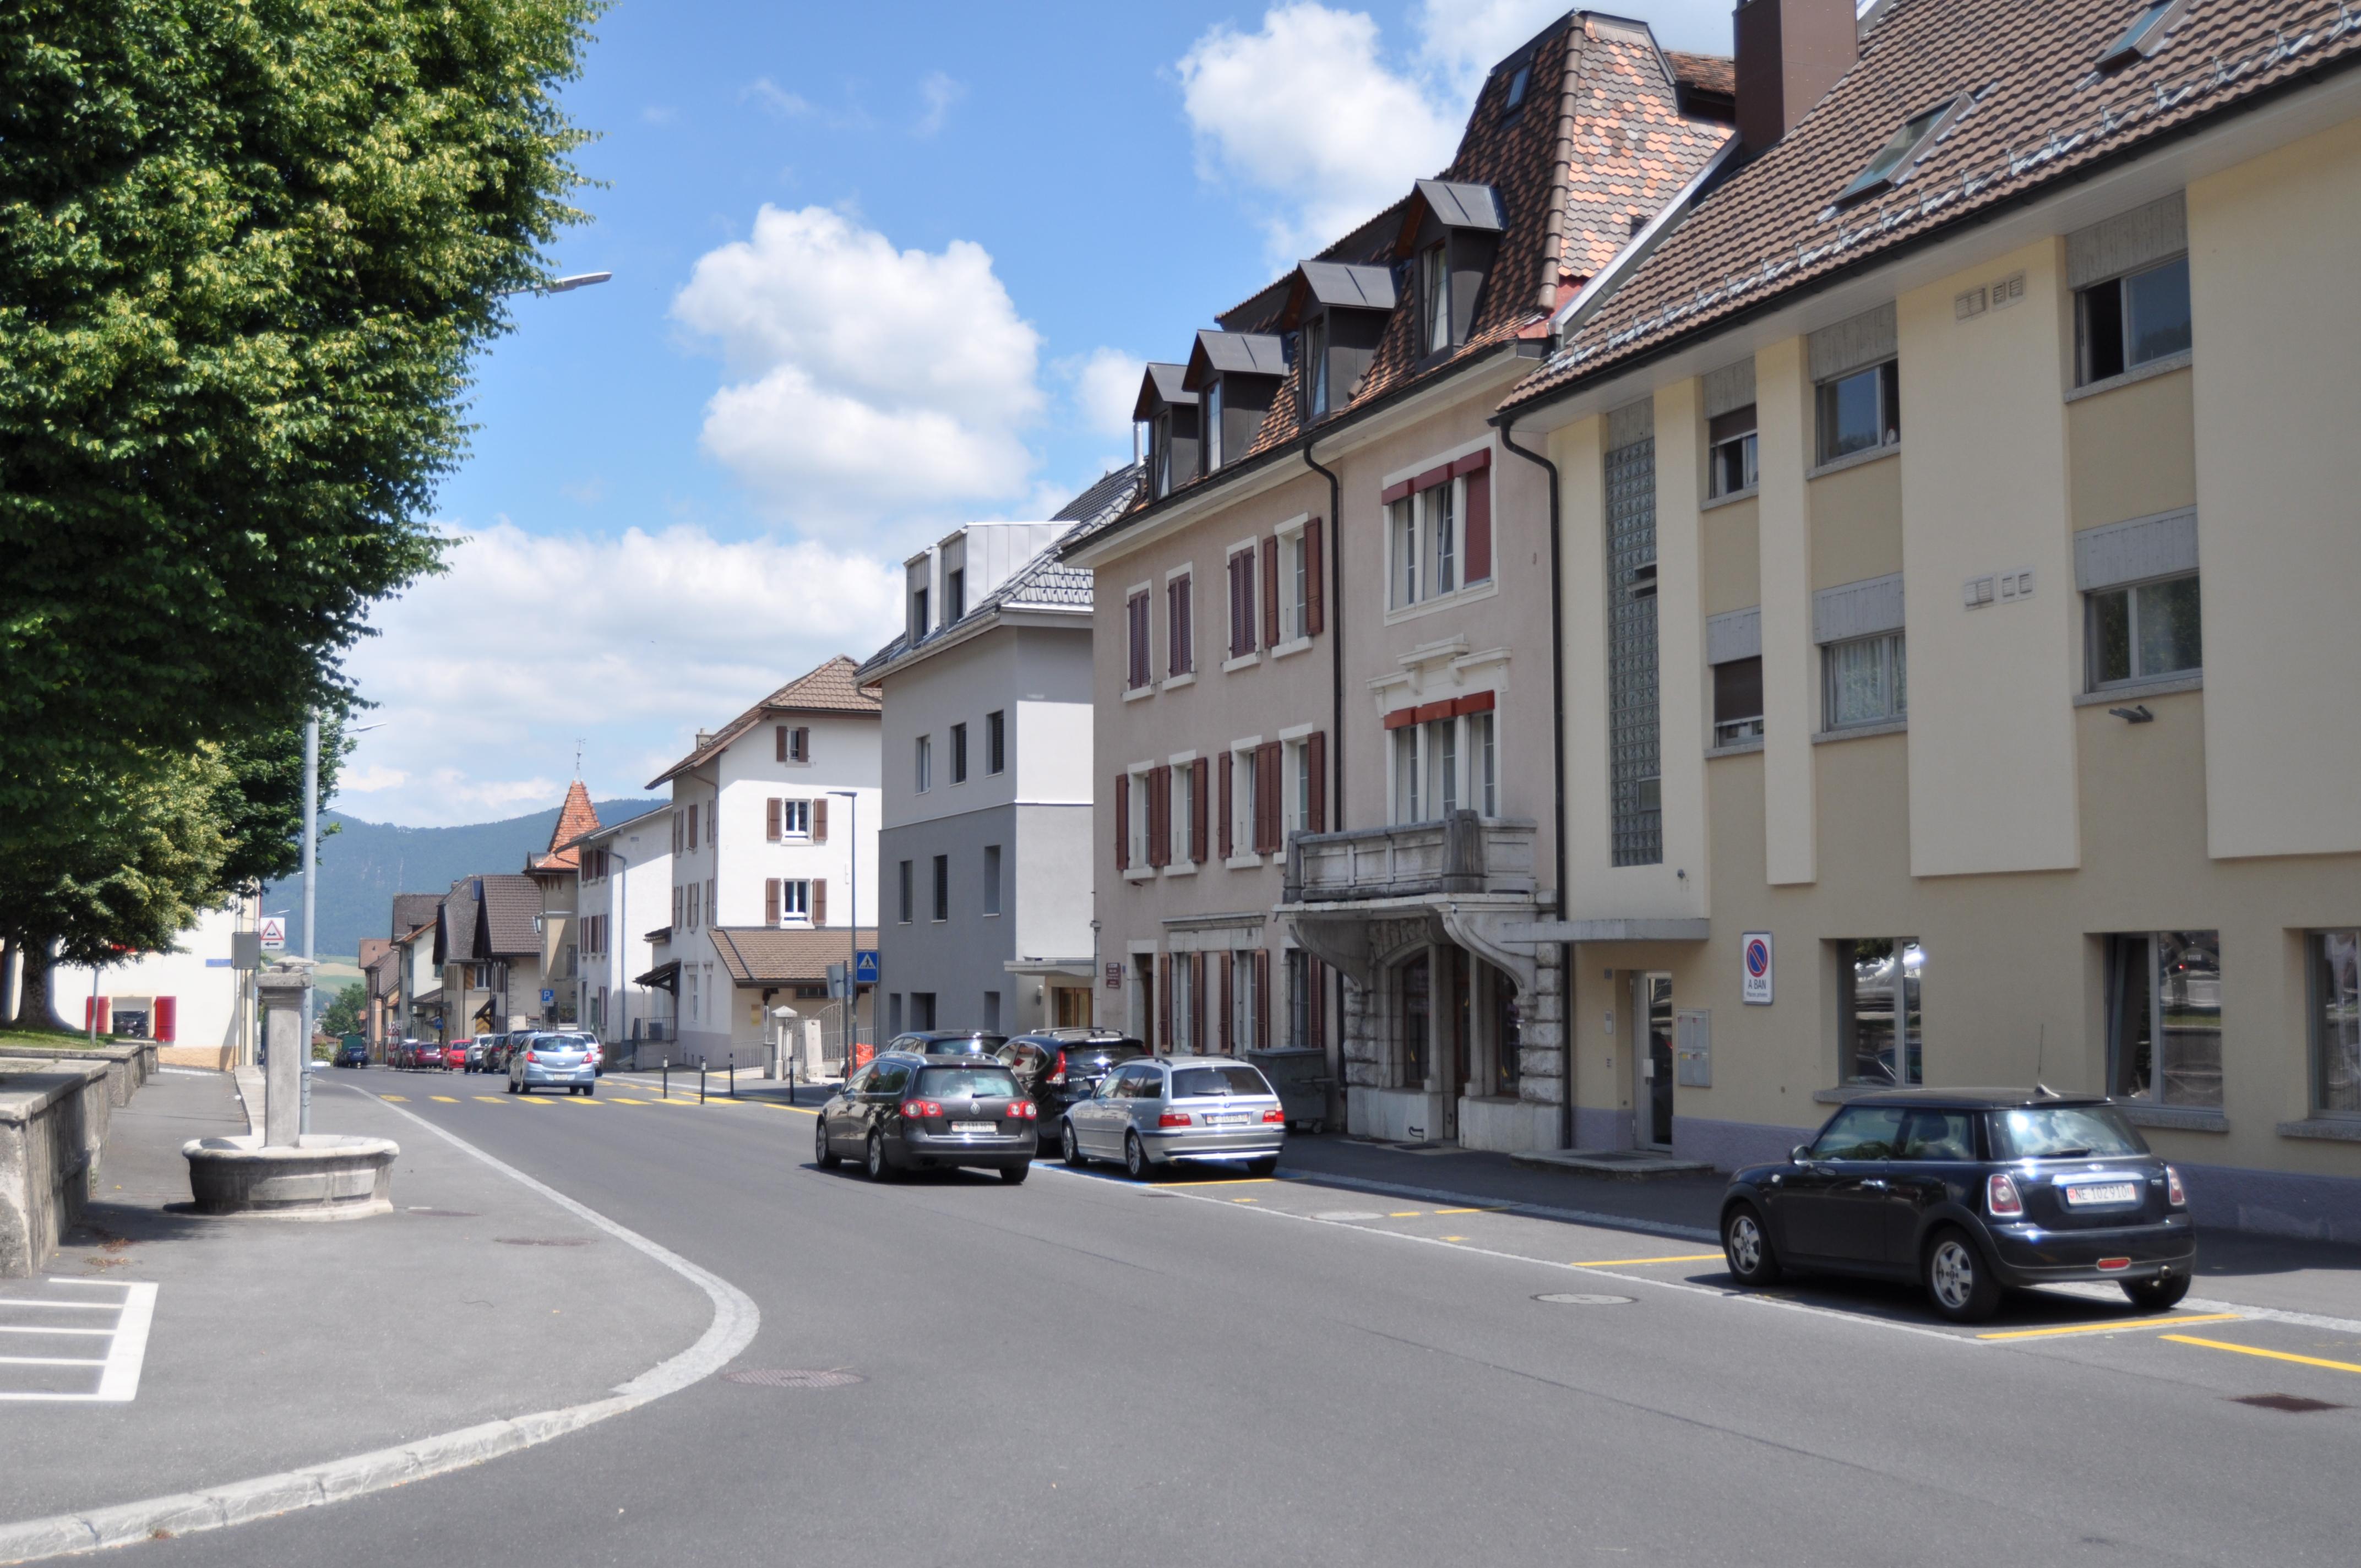 Cernier, rue Frédéric Soguel 18 en 2018